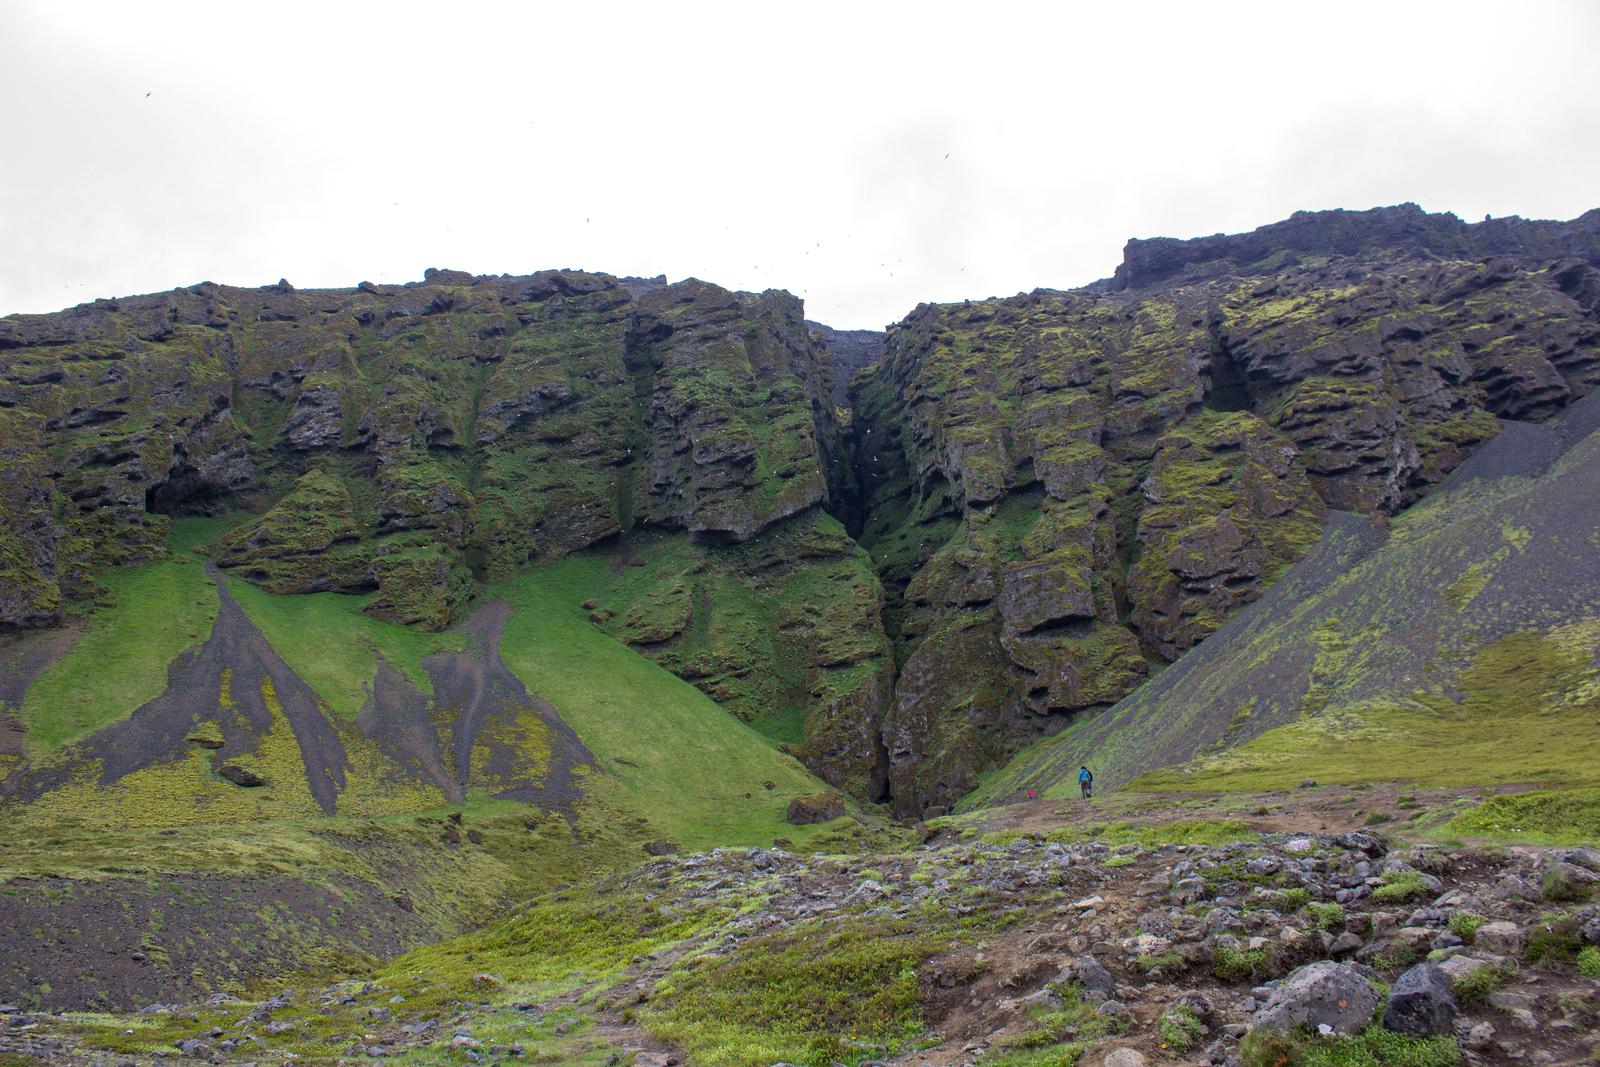 Raudfeldsgja Gorge - Snæfellsnes Peninsula Iceland Day Trip Travel Guide